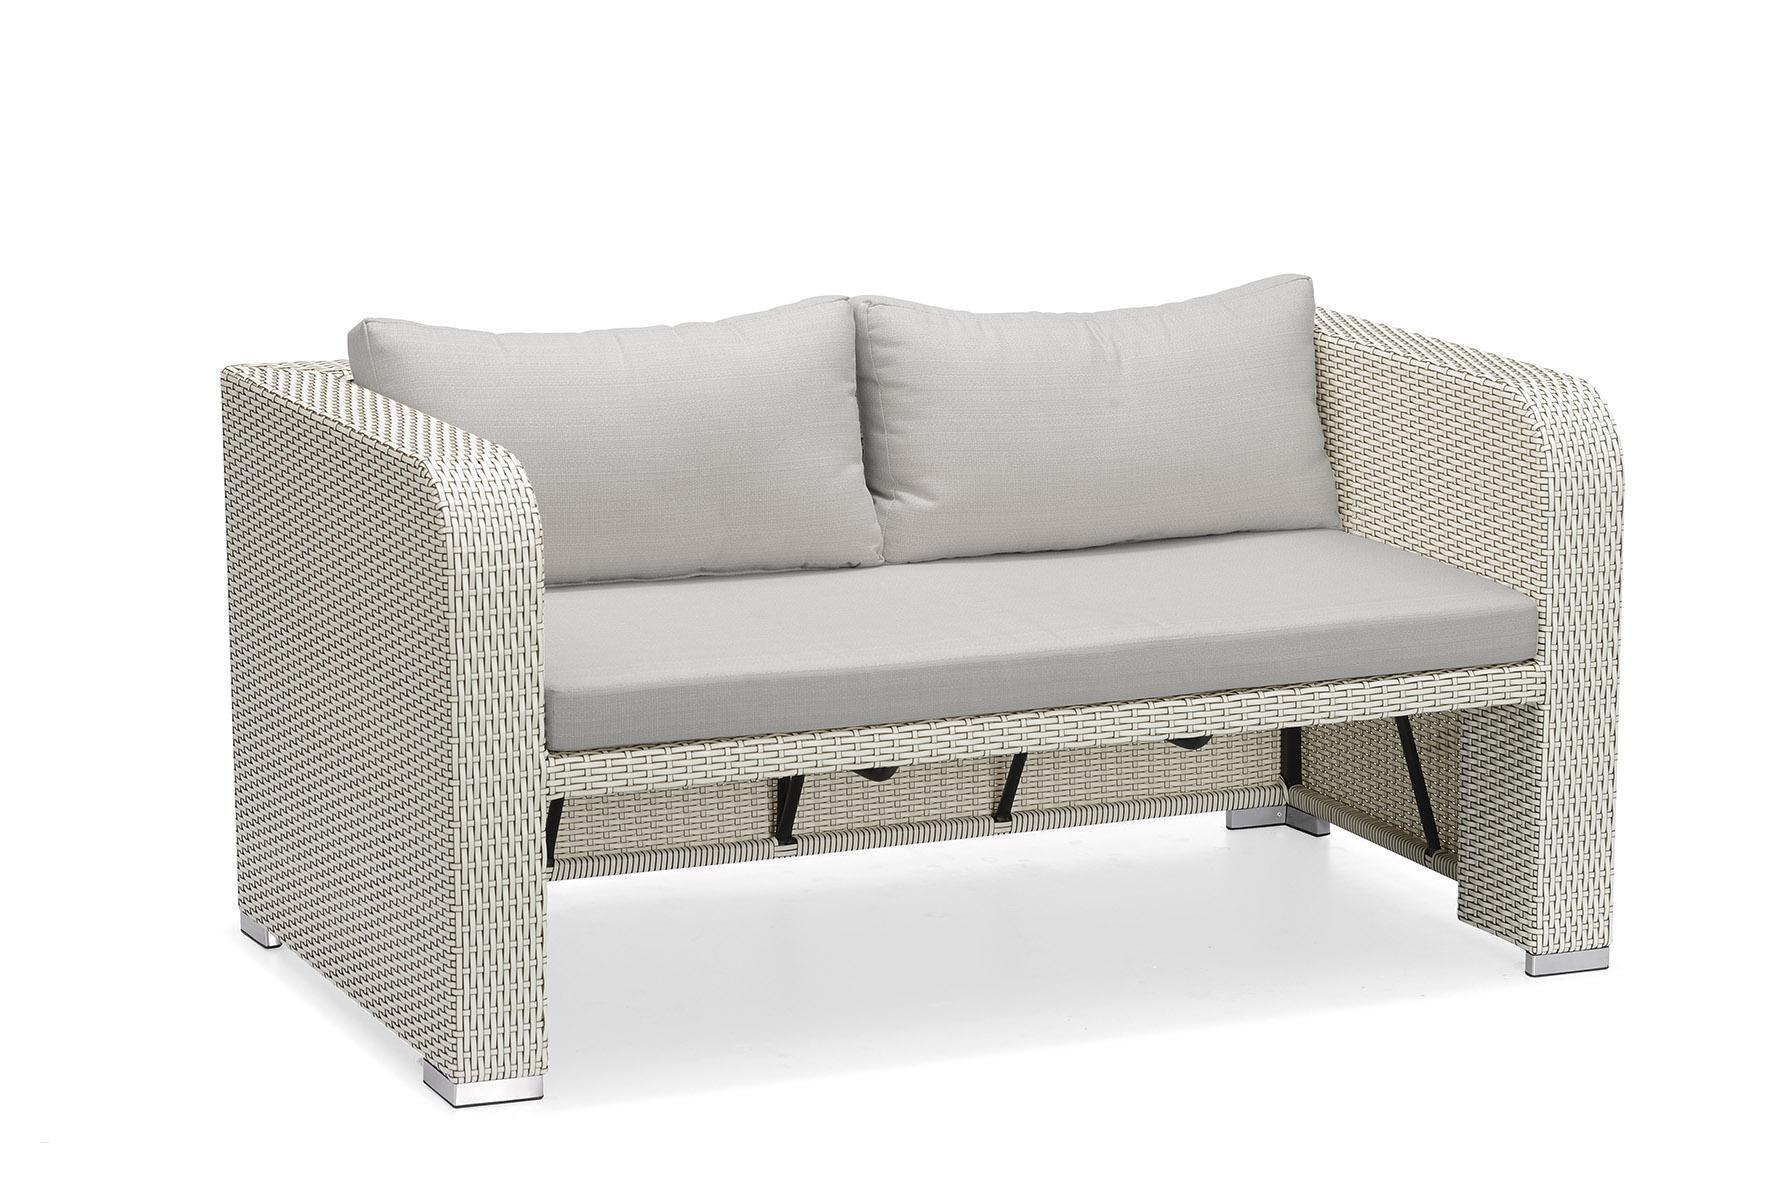 Portable Massage Chair Costco Folding Wooden Chairs Costco